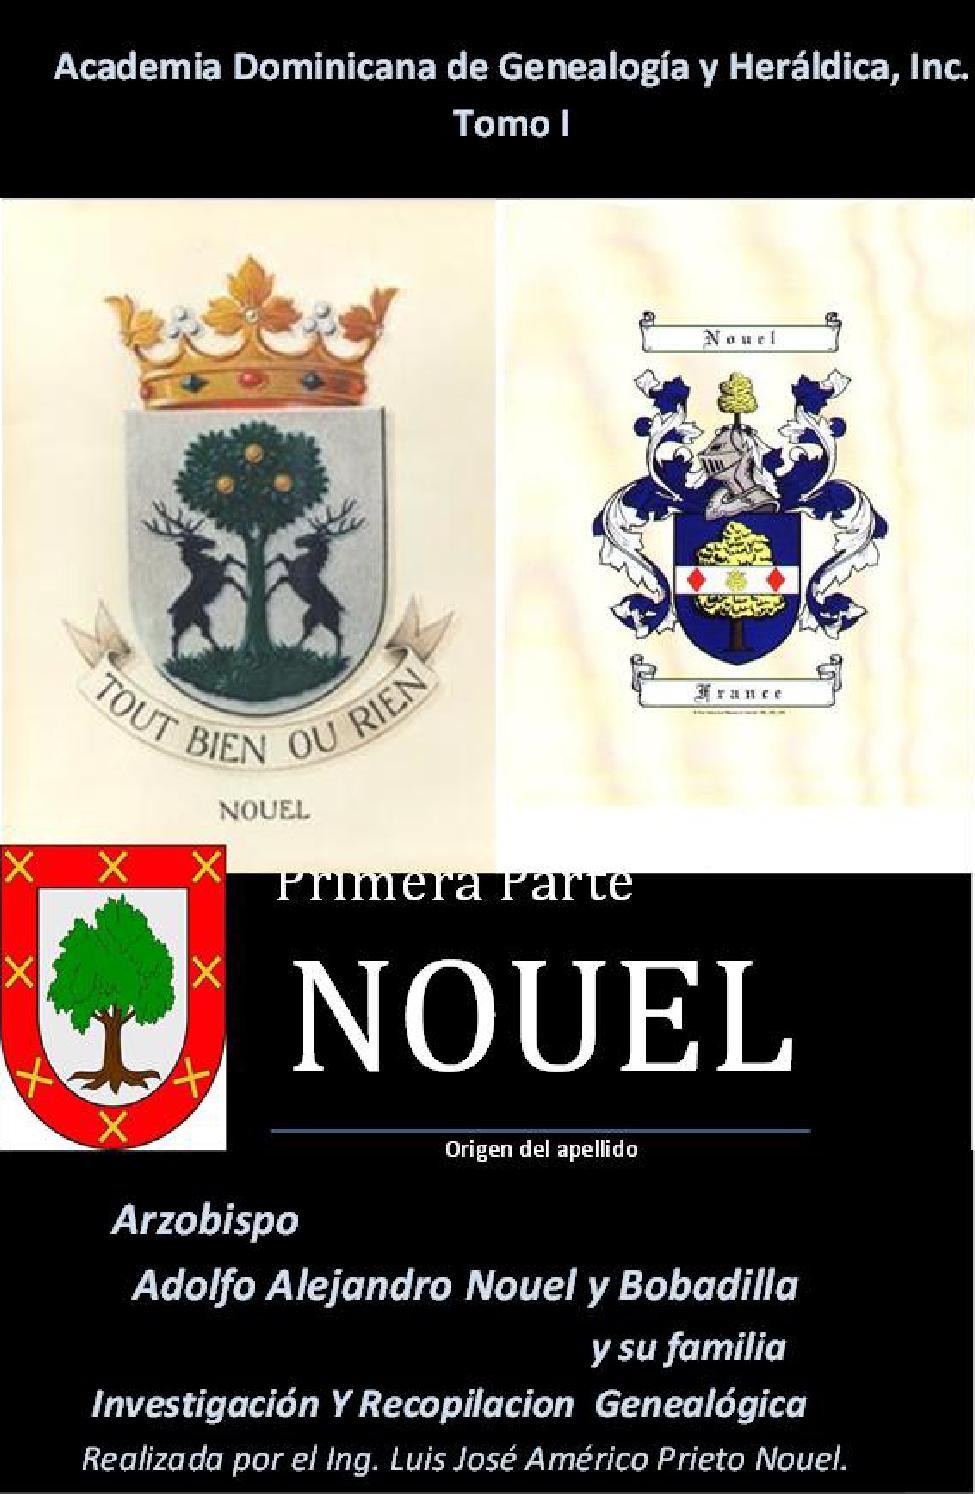 I origenes nouel pdf formato 6x9 by Academia Dominicana de ...